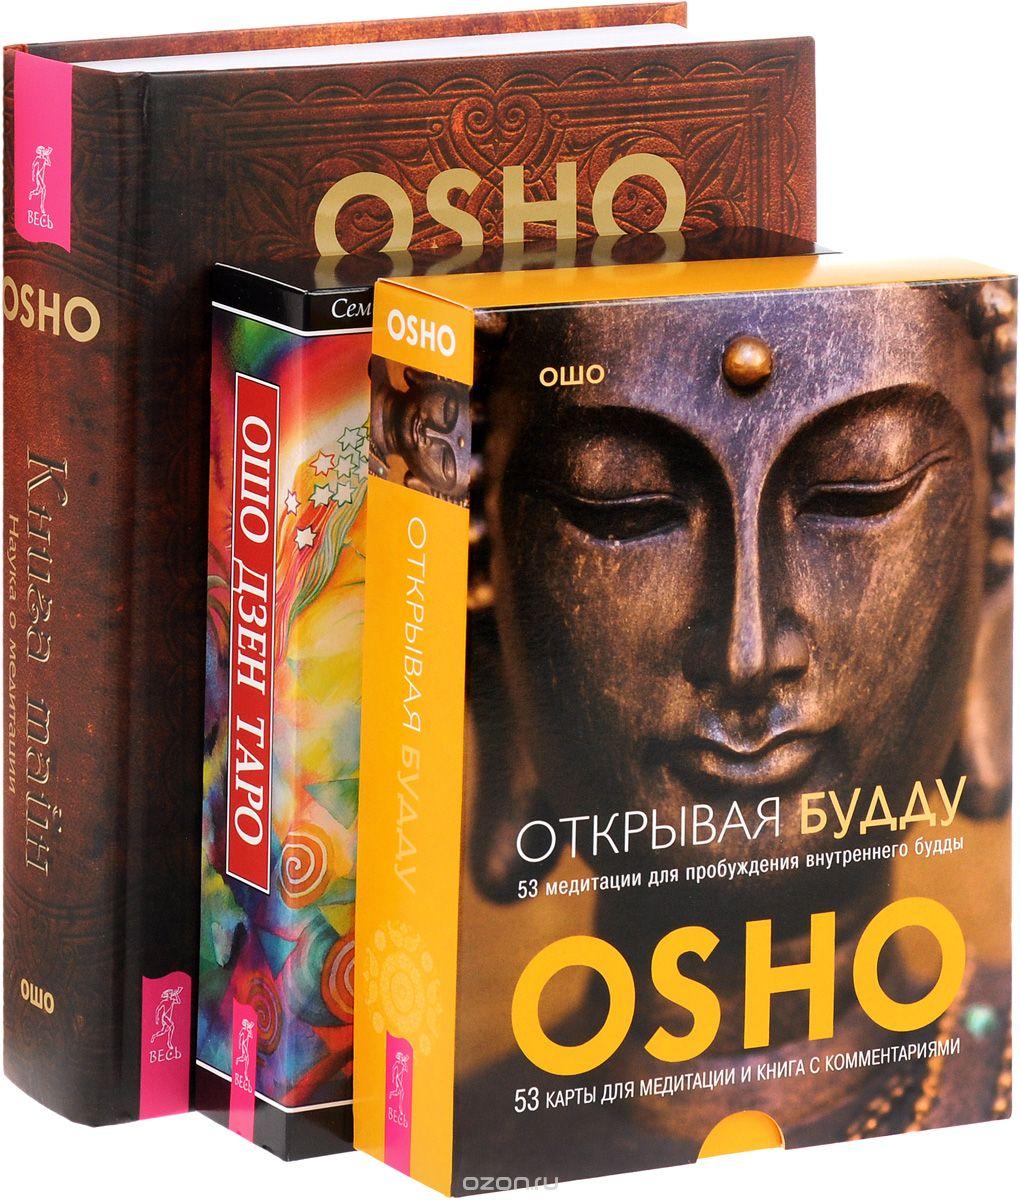 Раджниш Ошо: Открывая Будду. Ошо Дзен Таро. Книга тайн (комплект из 3 книг)